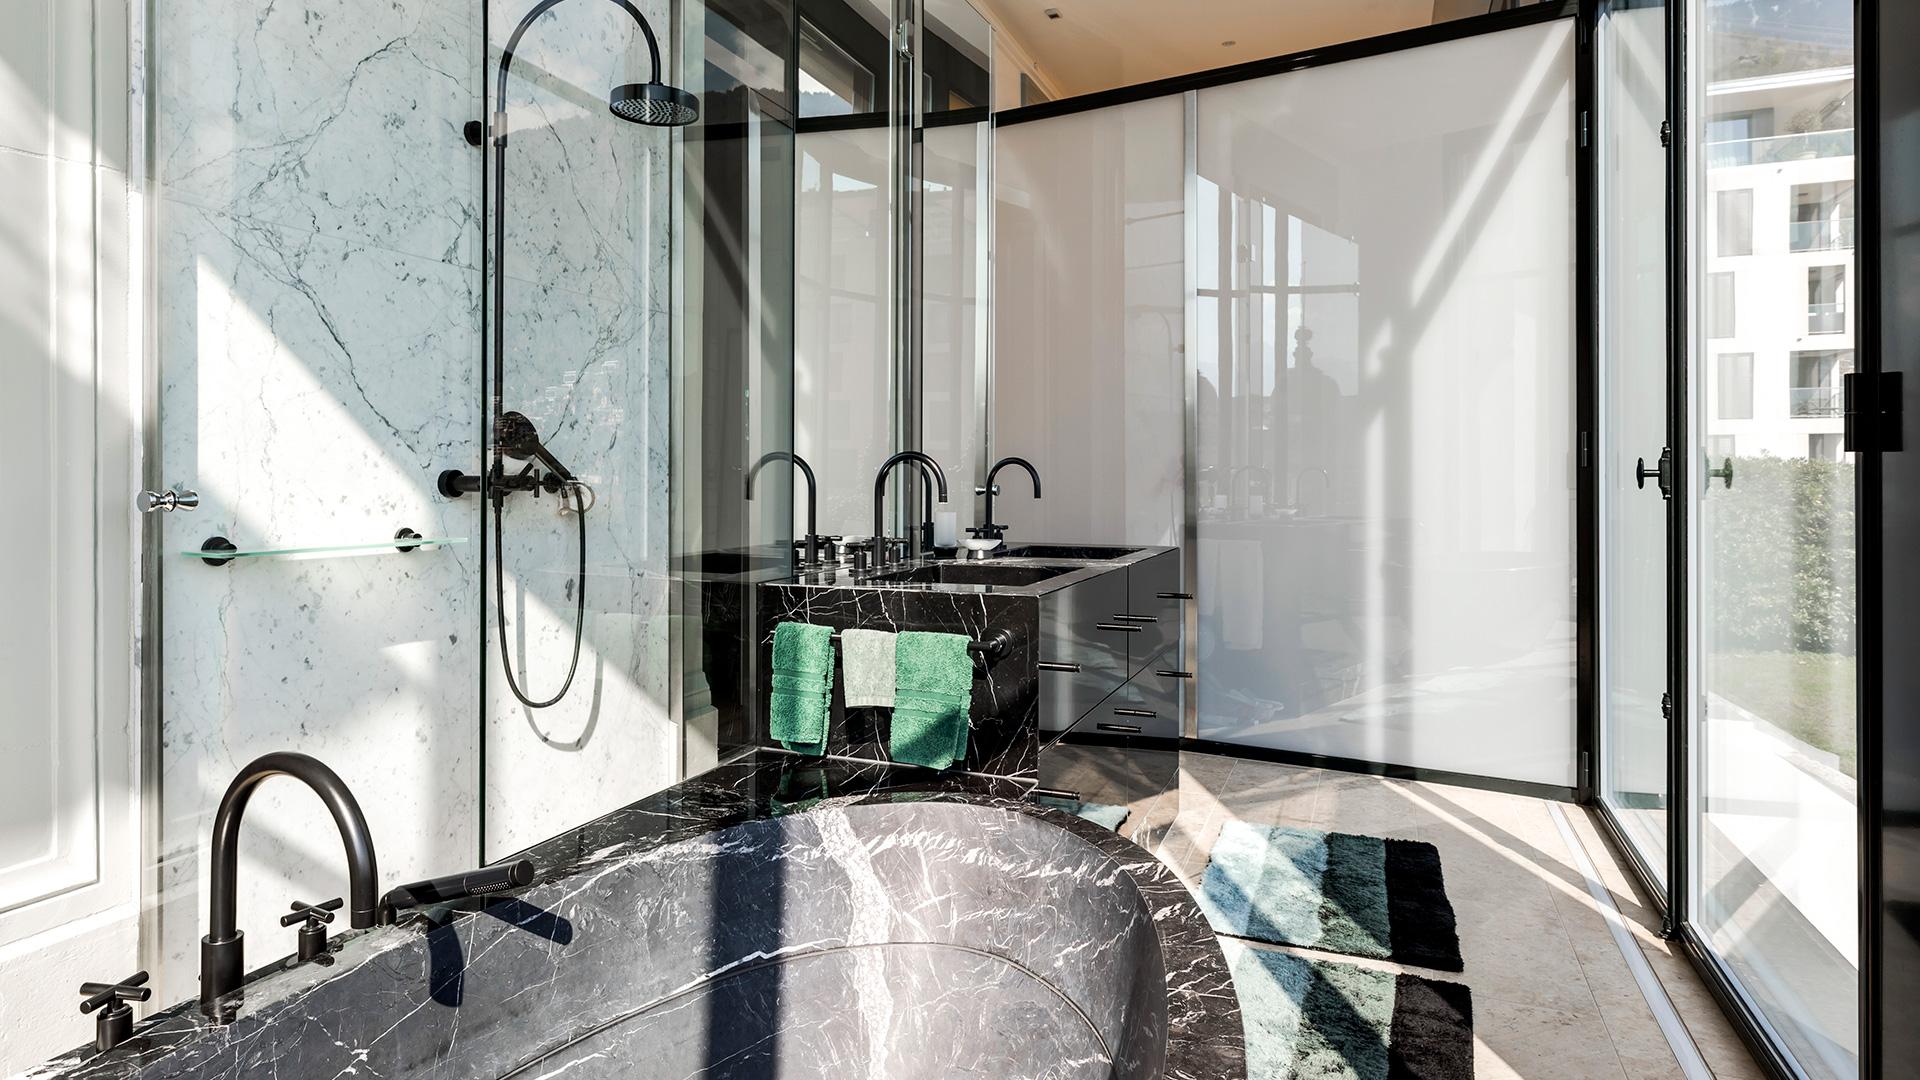 Le National 2 Apartments, Switzerland